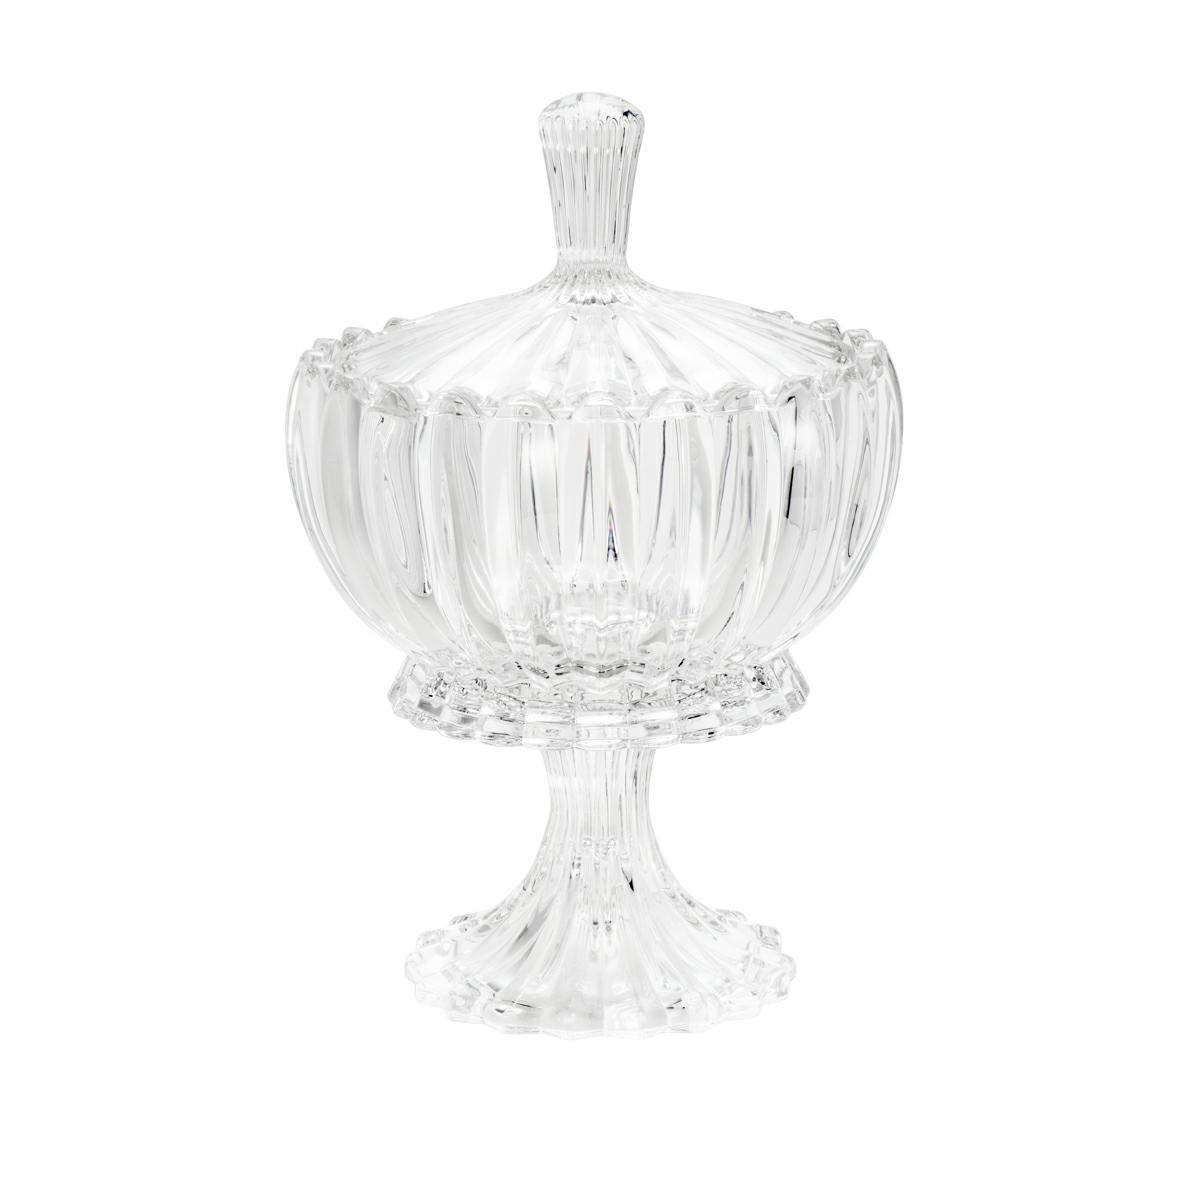 Bomboniere 11 cm de cristal transparente com tampa e pé Geneva Wolff - 25609